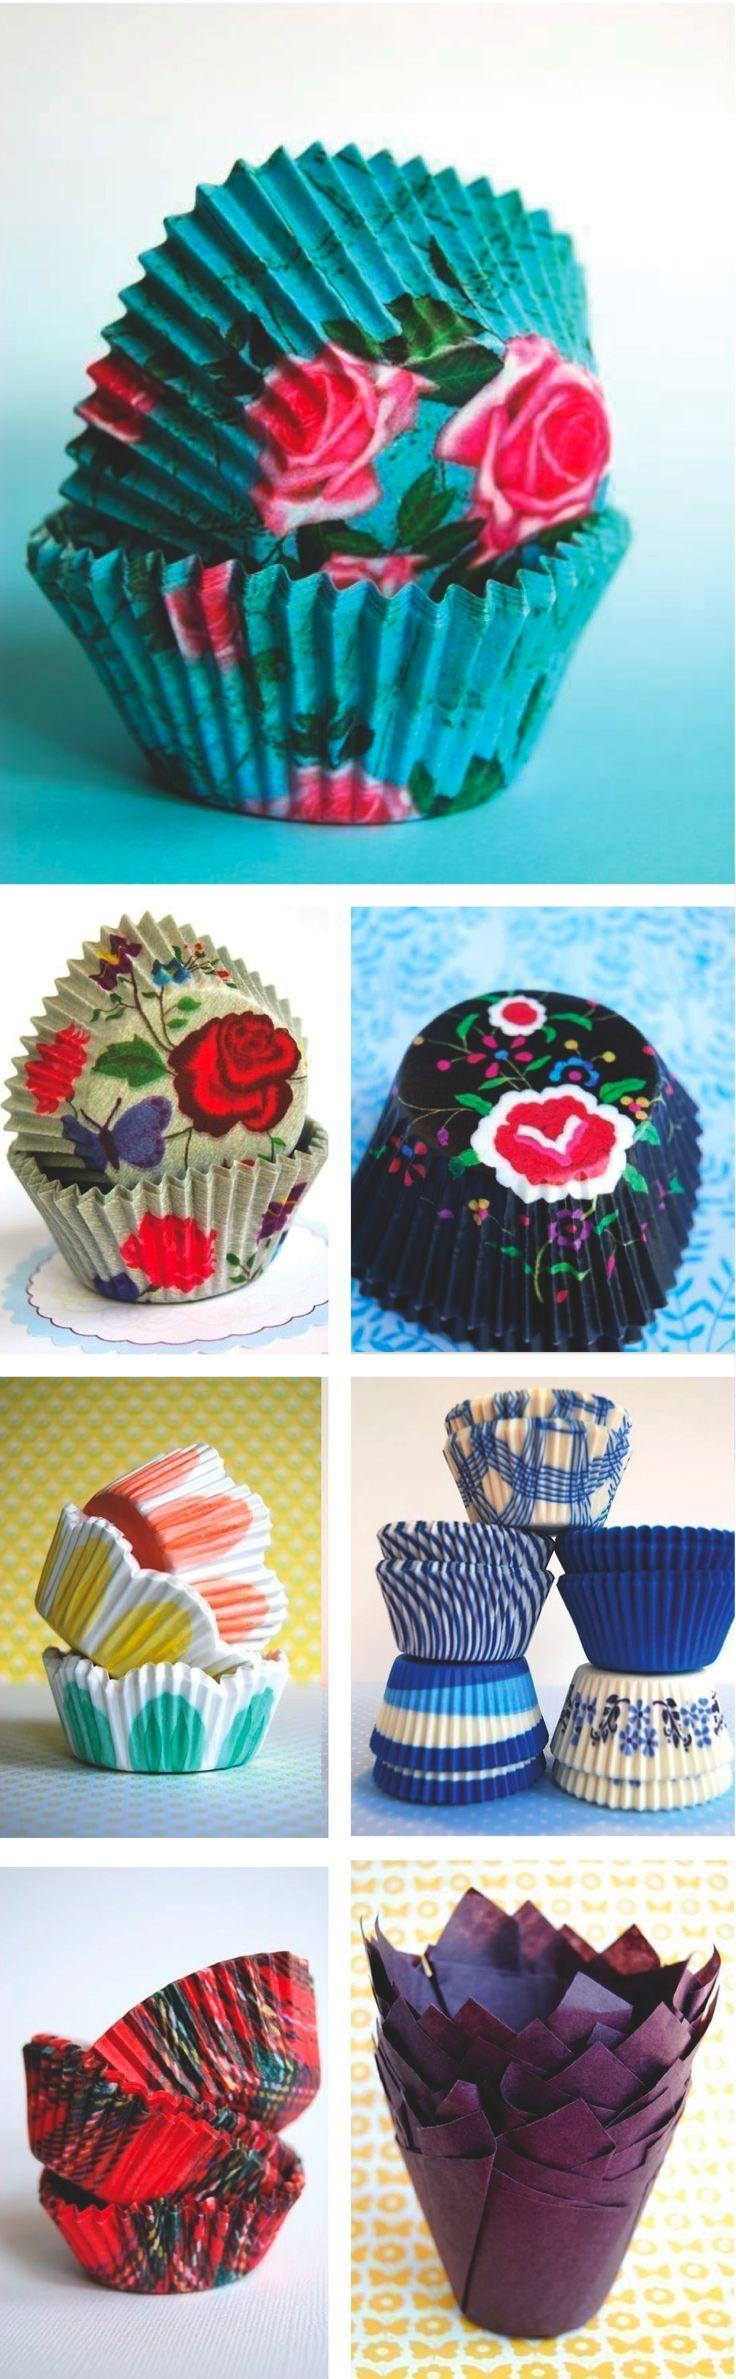 cupcake holder SO MANY CHOICES!!